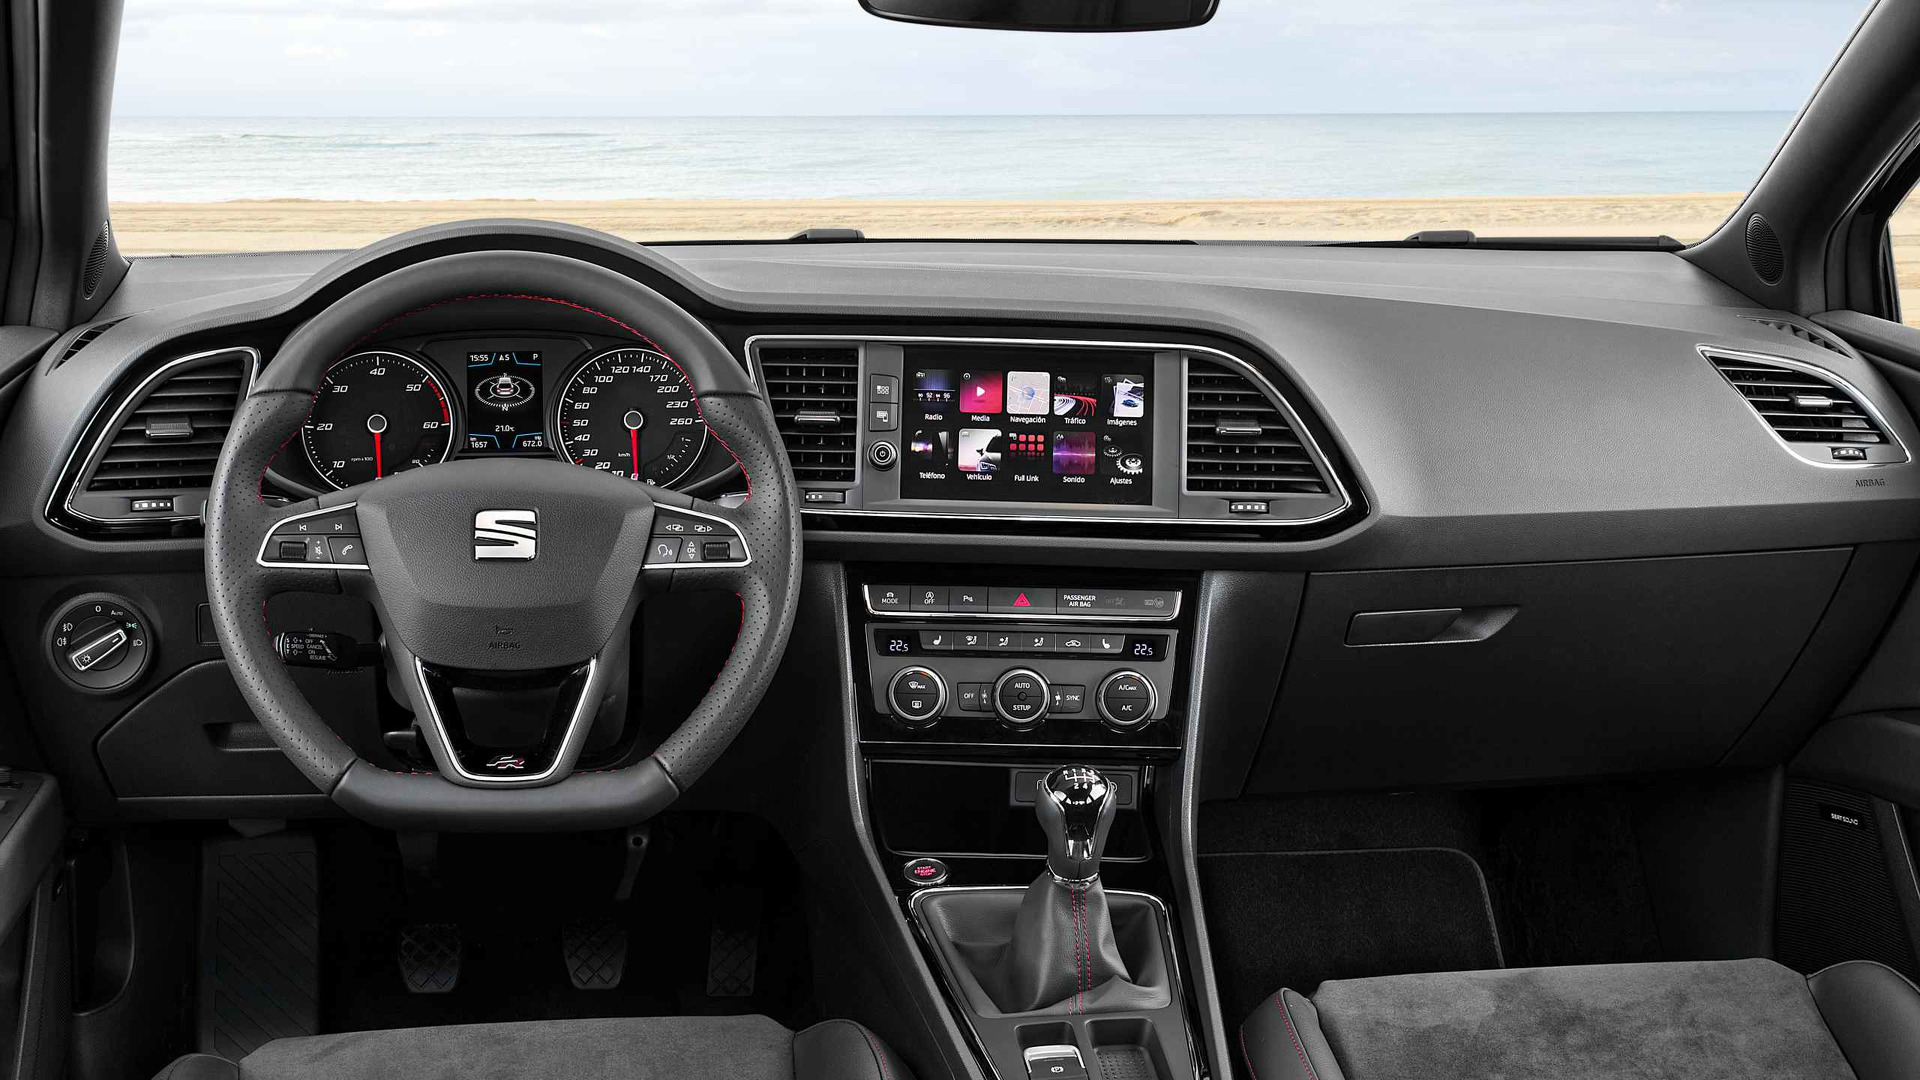 2017 Seat Leon SC Review